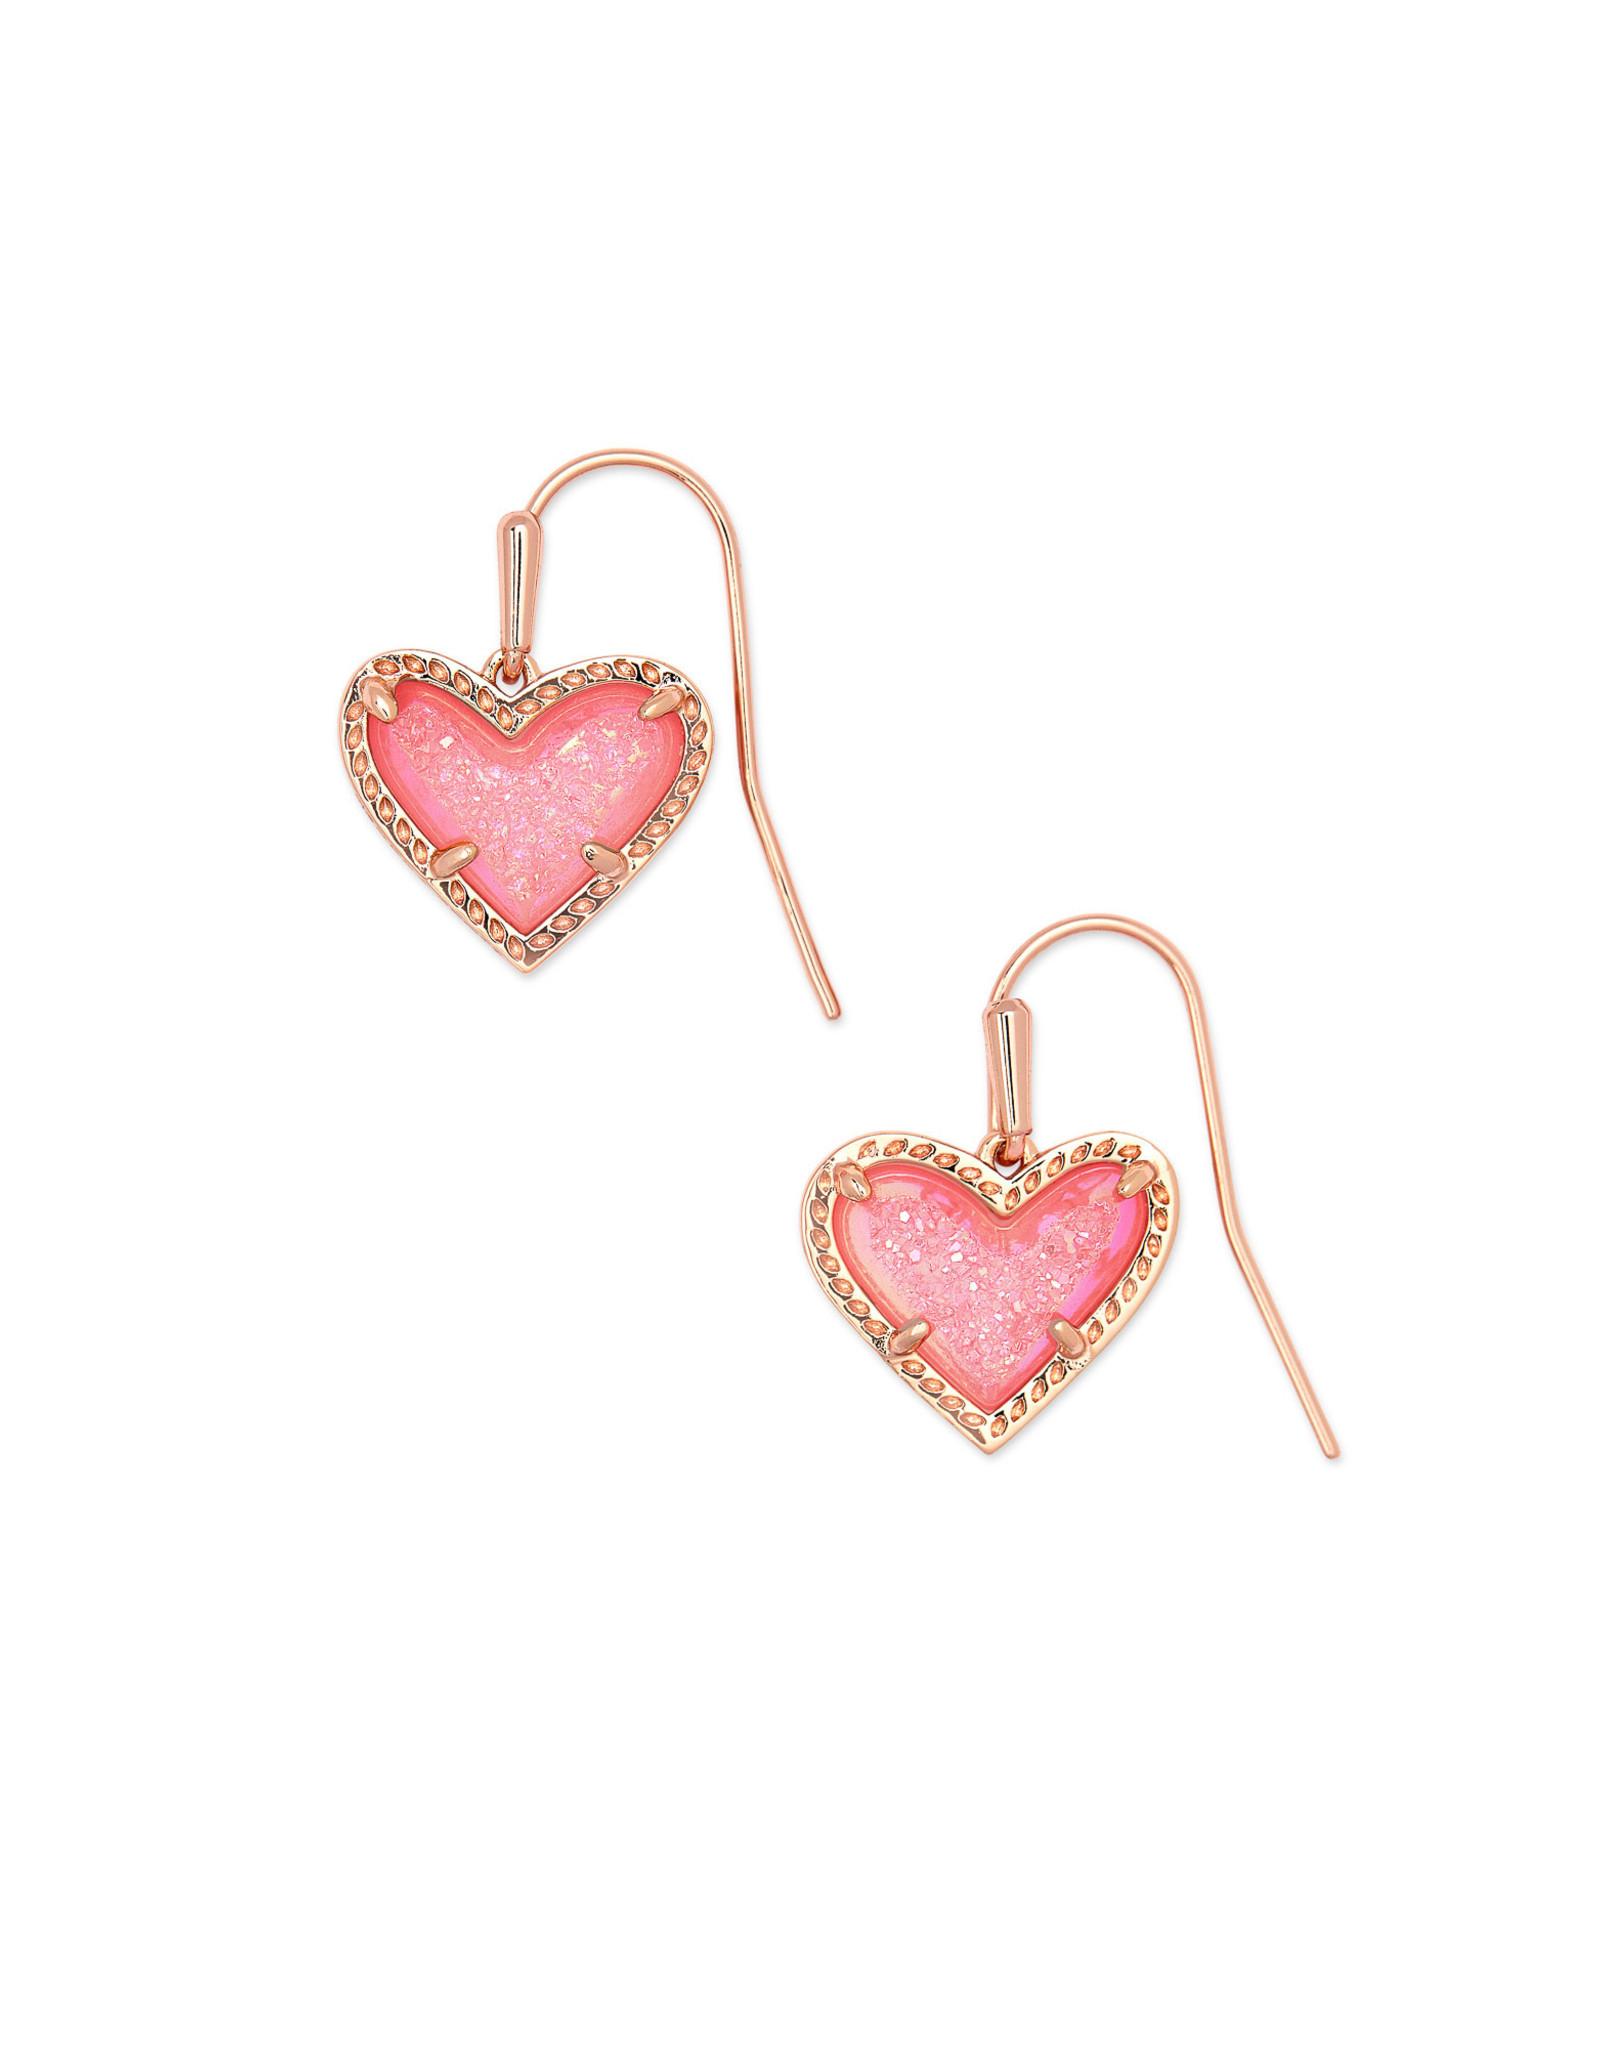 Kendra Scott Ari Heart Drop Earring - Pink Drusy/Rose Gold